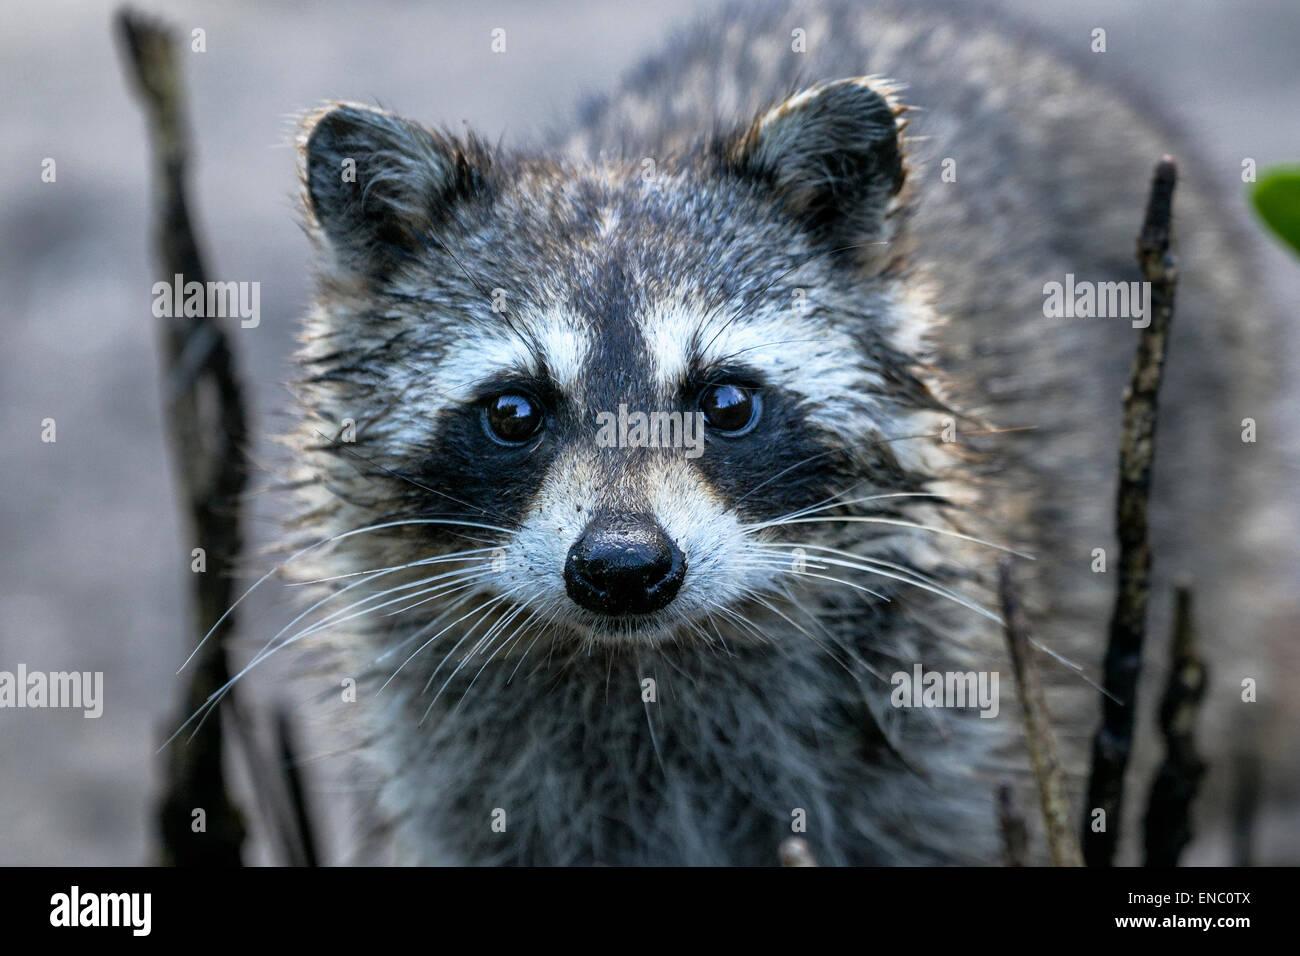 procyon lotor, raccoon - Stock Image